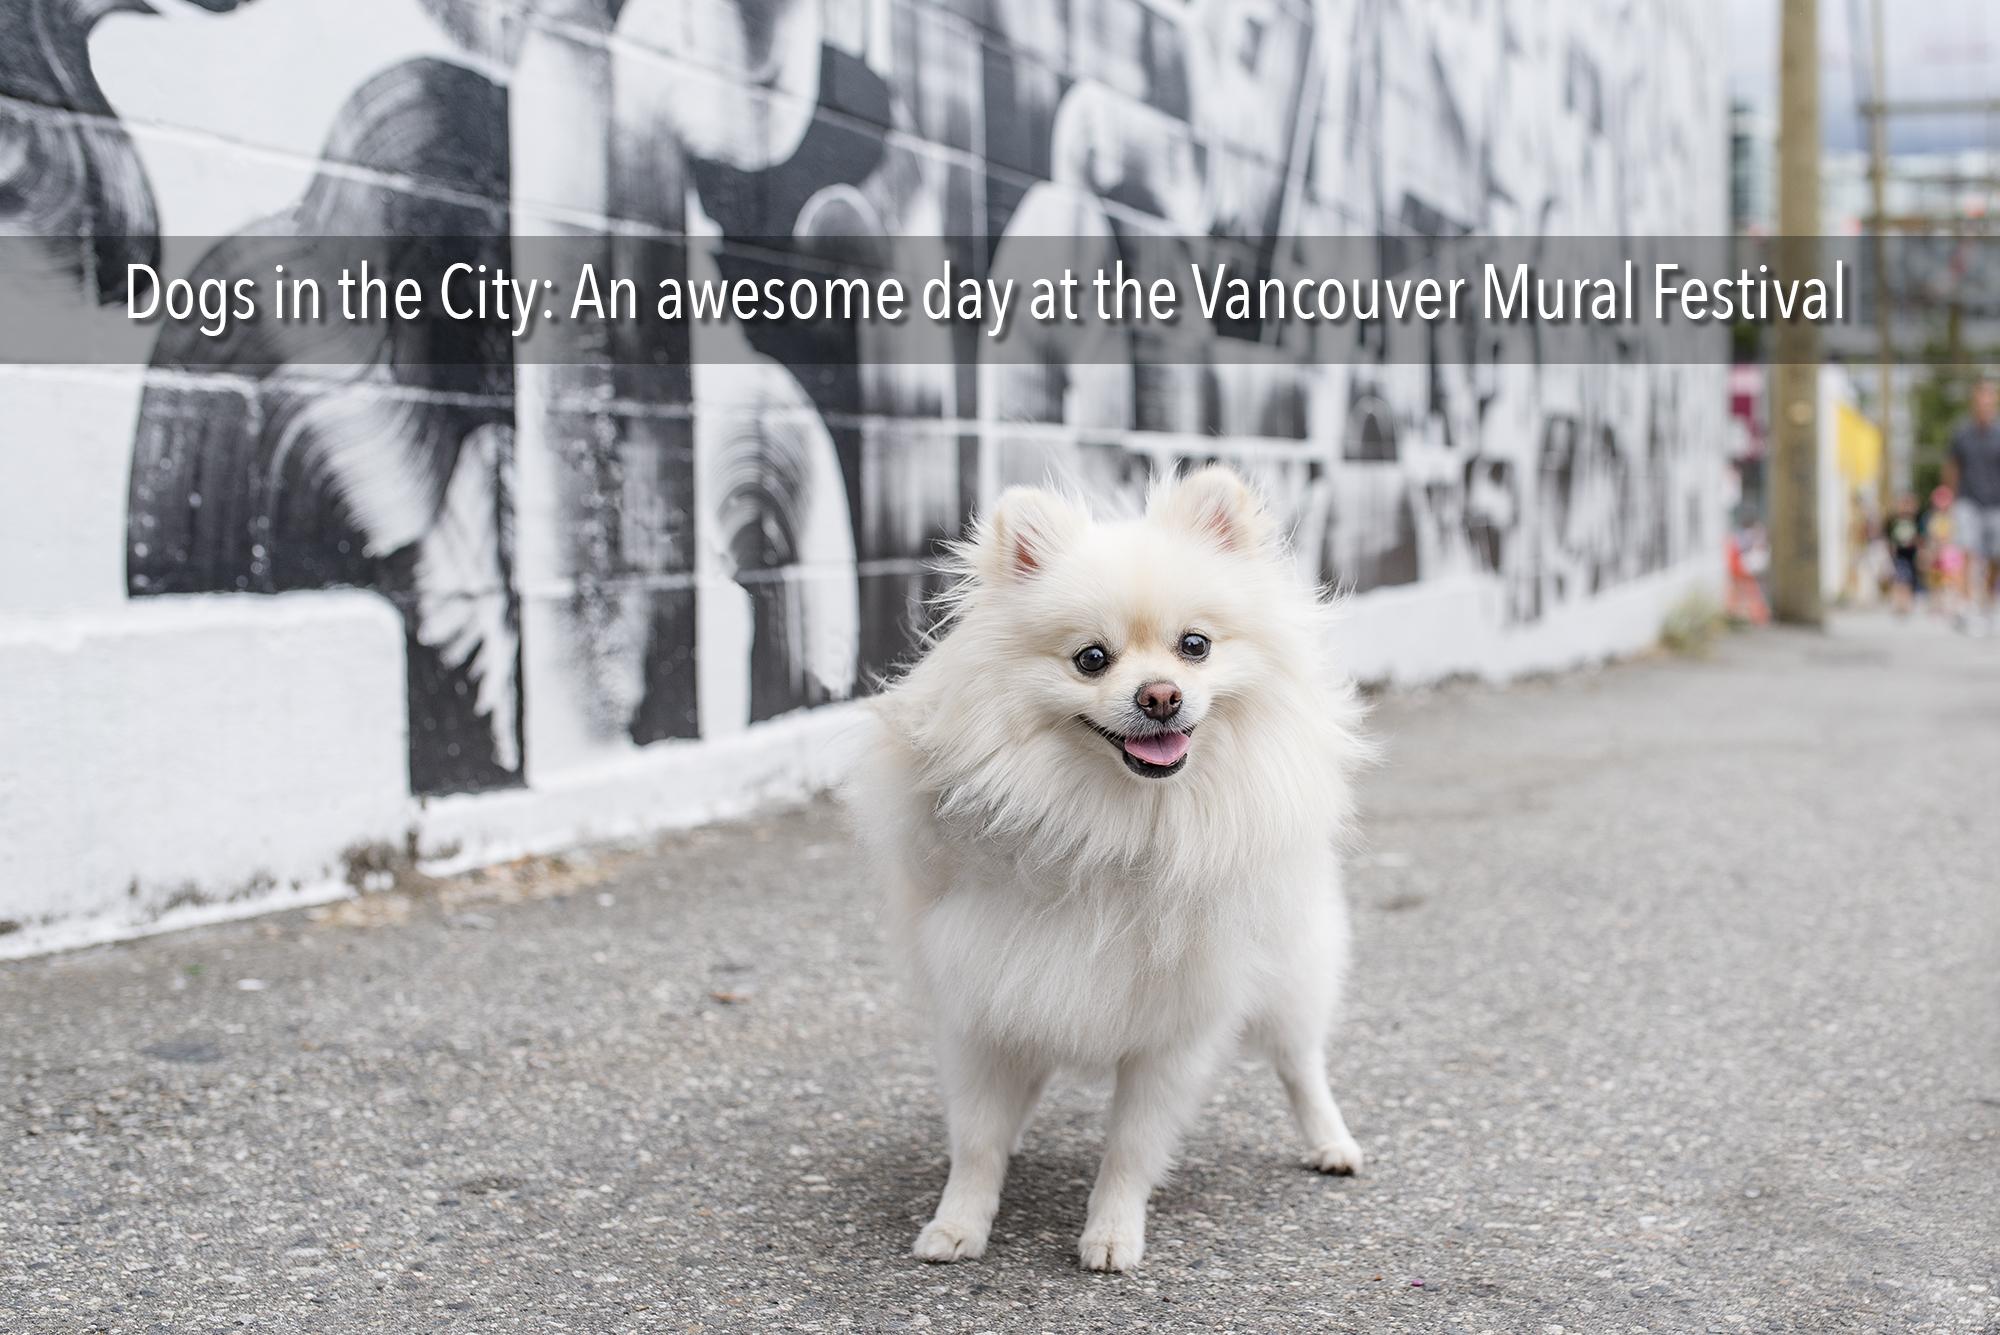 Dog_at_Vancouver_Mural_Festival.jpg